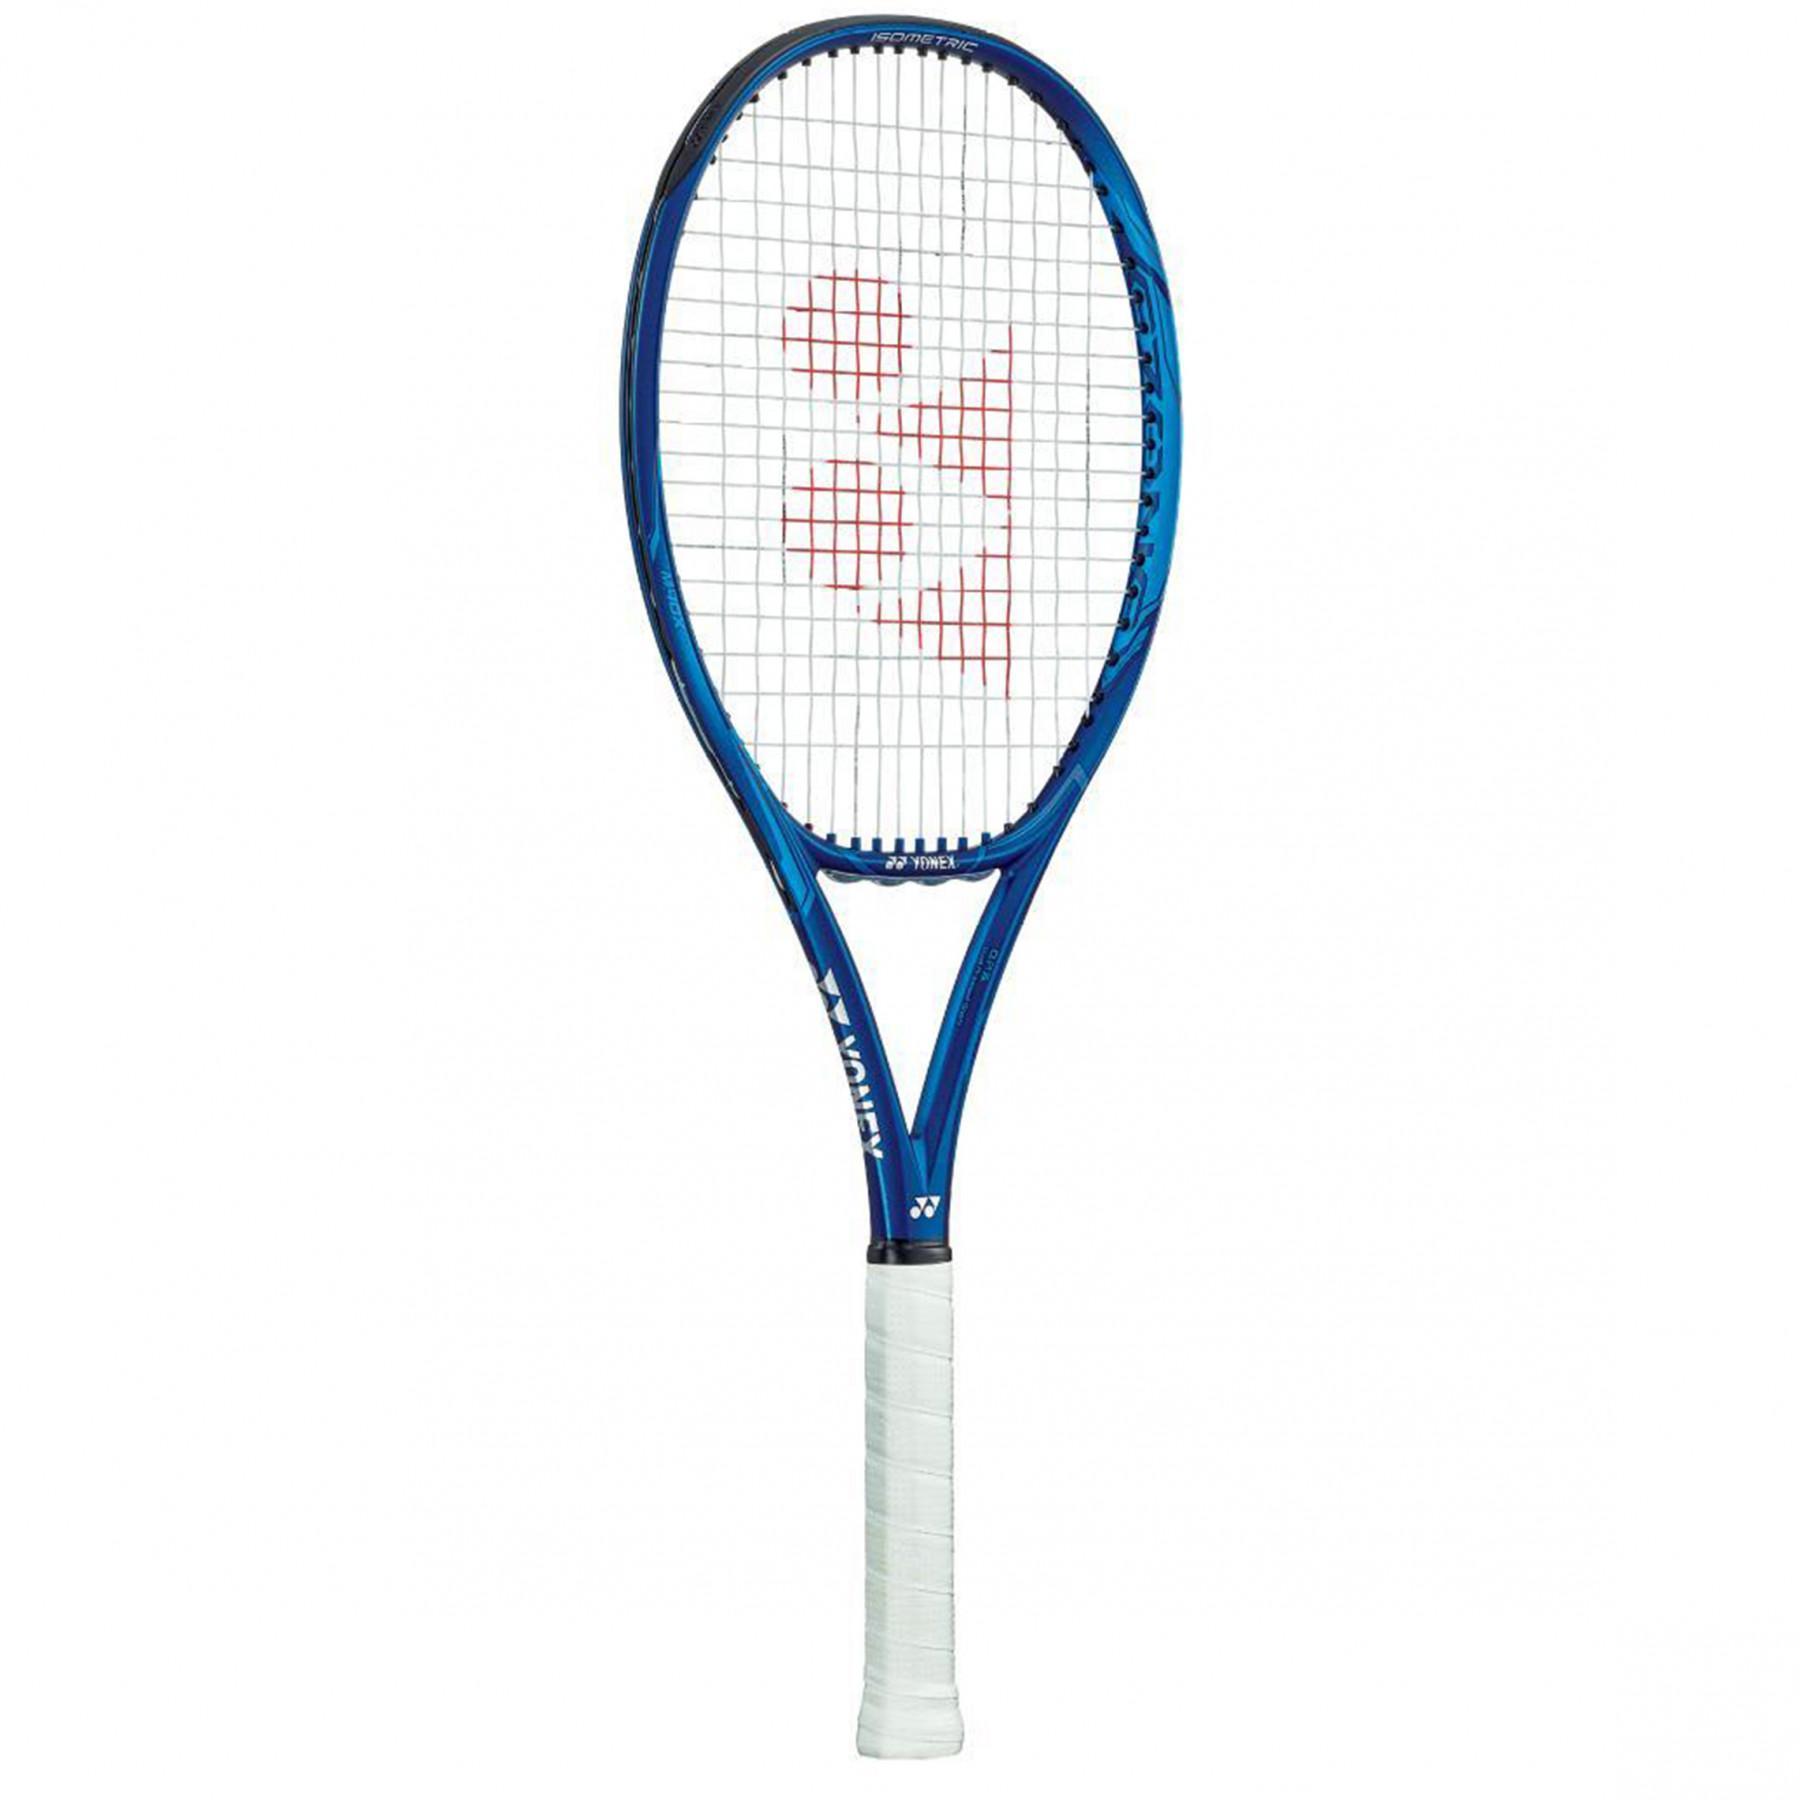 Racket Yonex Ezone 98 L